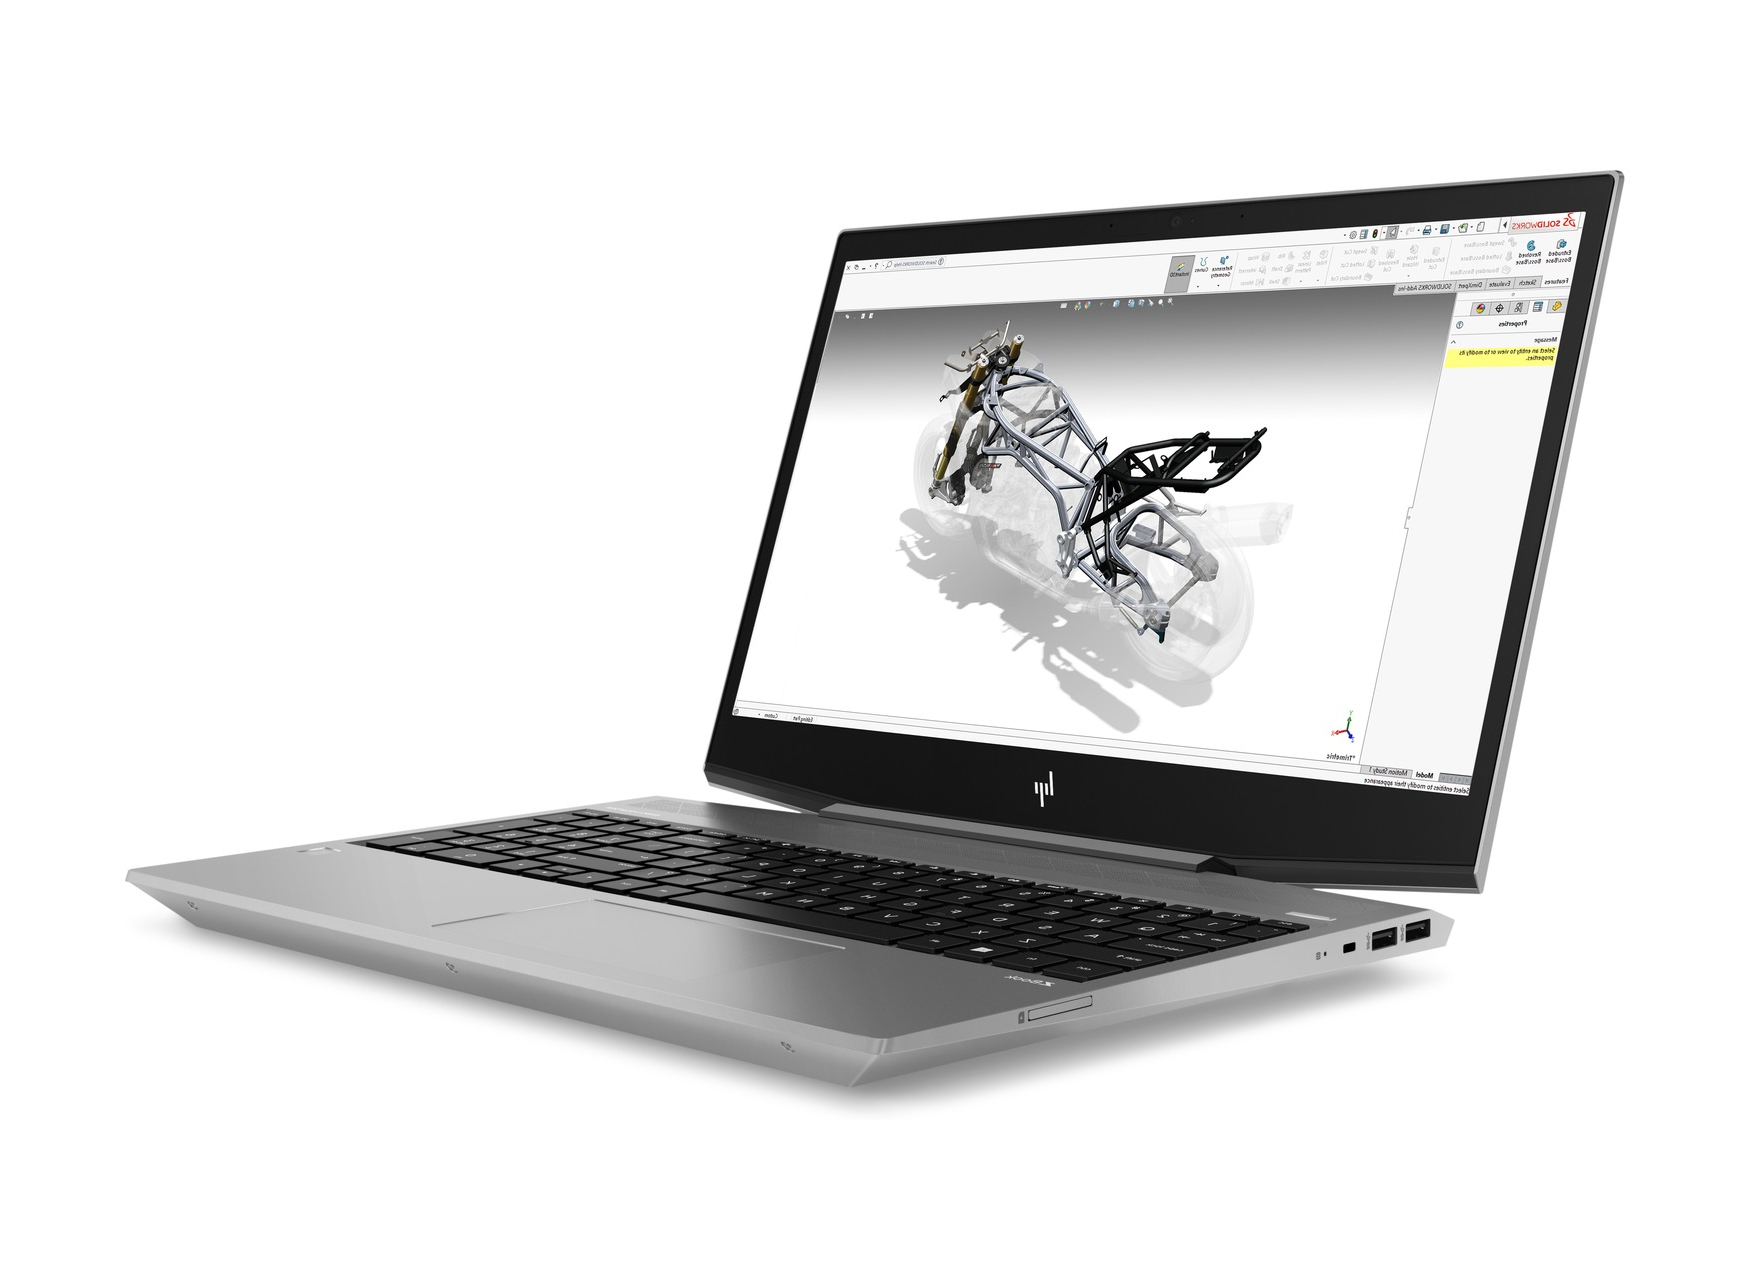 Workstation Portatil X8d1 Workstation Portà Til Hp Zbook 15v G5 Coreâ I7 8 Gb 256 Gb Nvidia